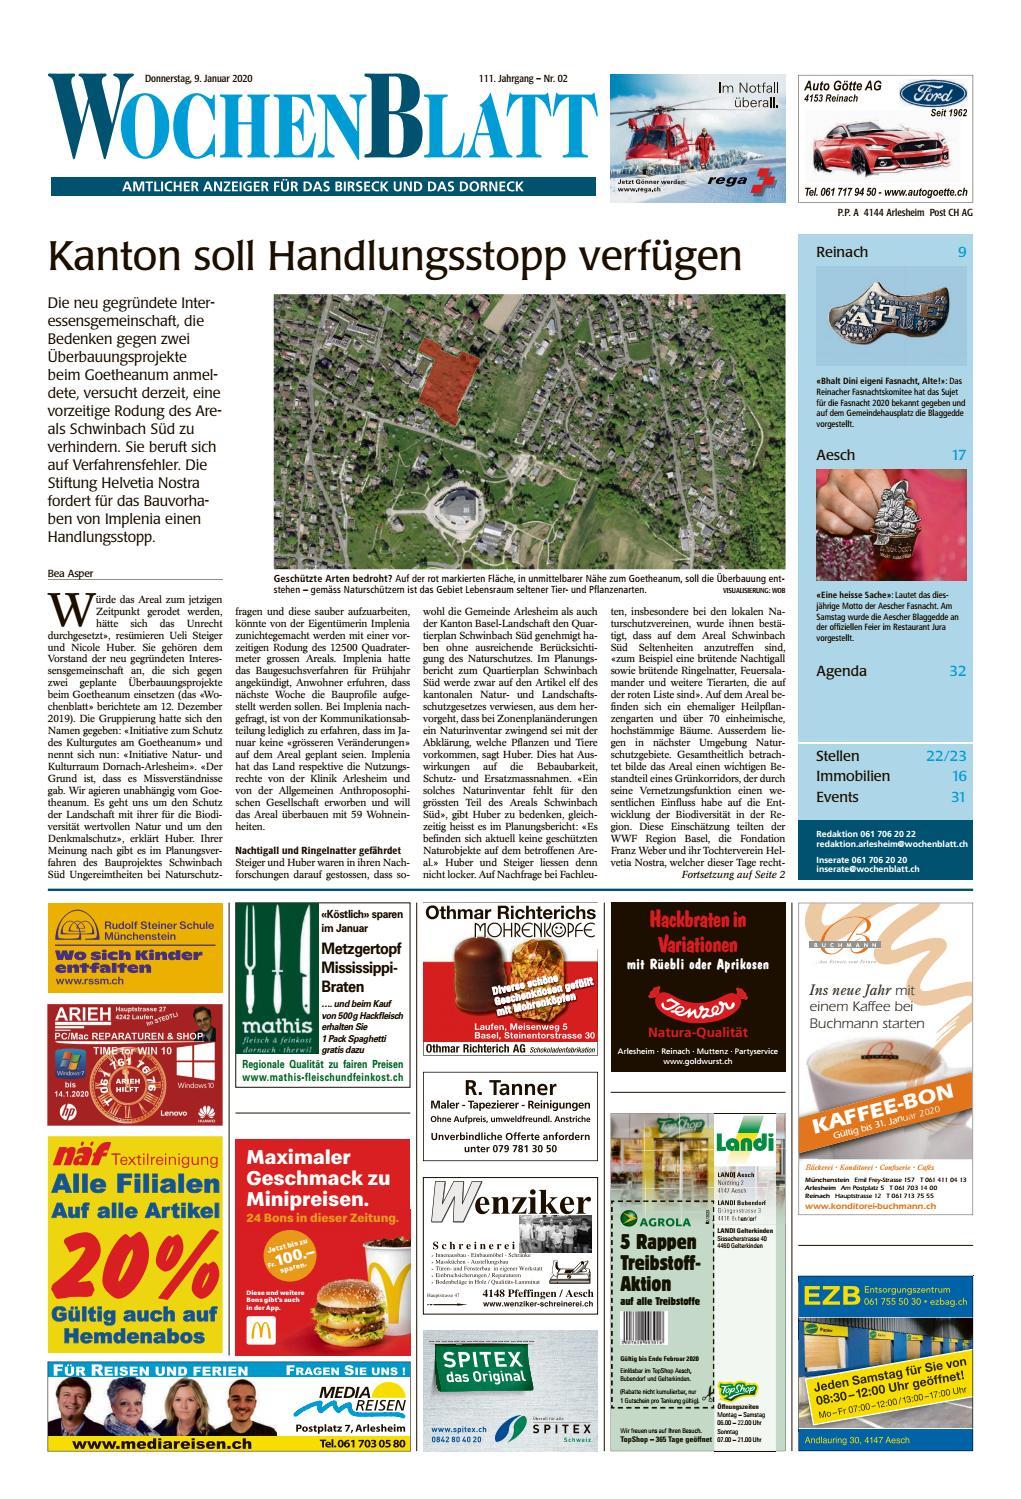 Unterhaltskosten/ Winterdienst Gemeindestr. 3. Klasse - PDF